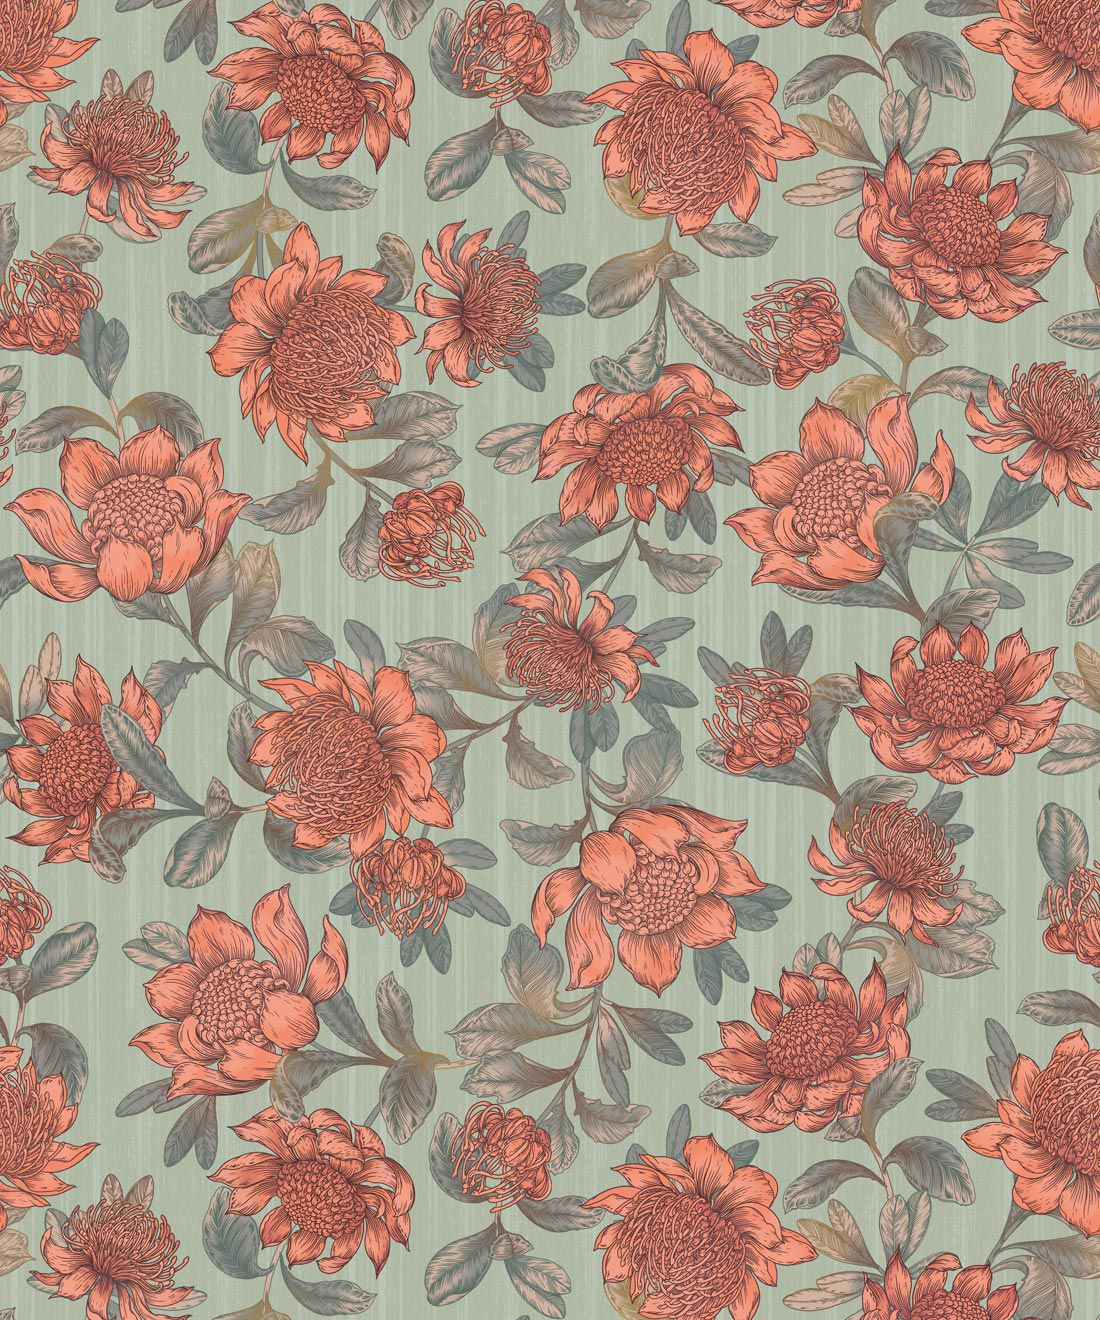 Waratah Wallpaper • Eloise Short • Vintage Floral Wallpaper •Granny Chic Wallpaper • Grandmillennial Style Wallpaper •Green •Swatch